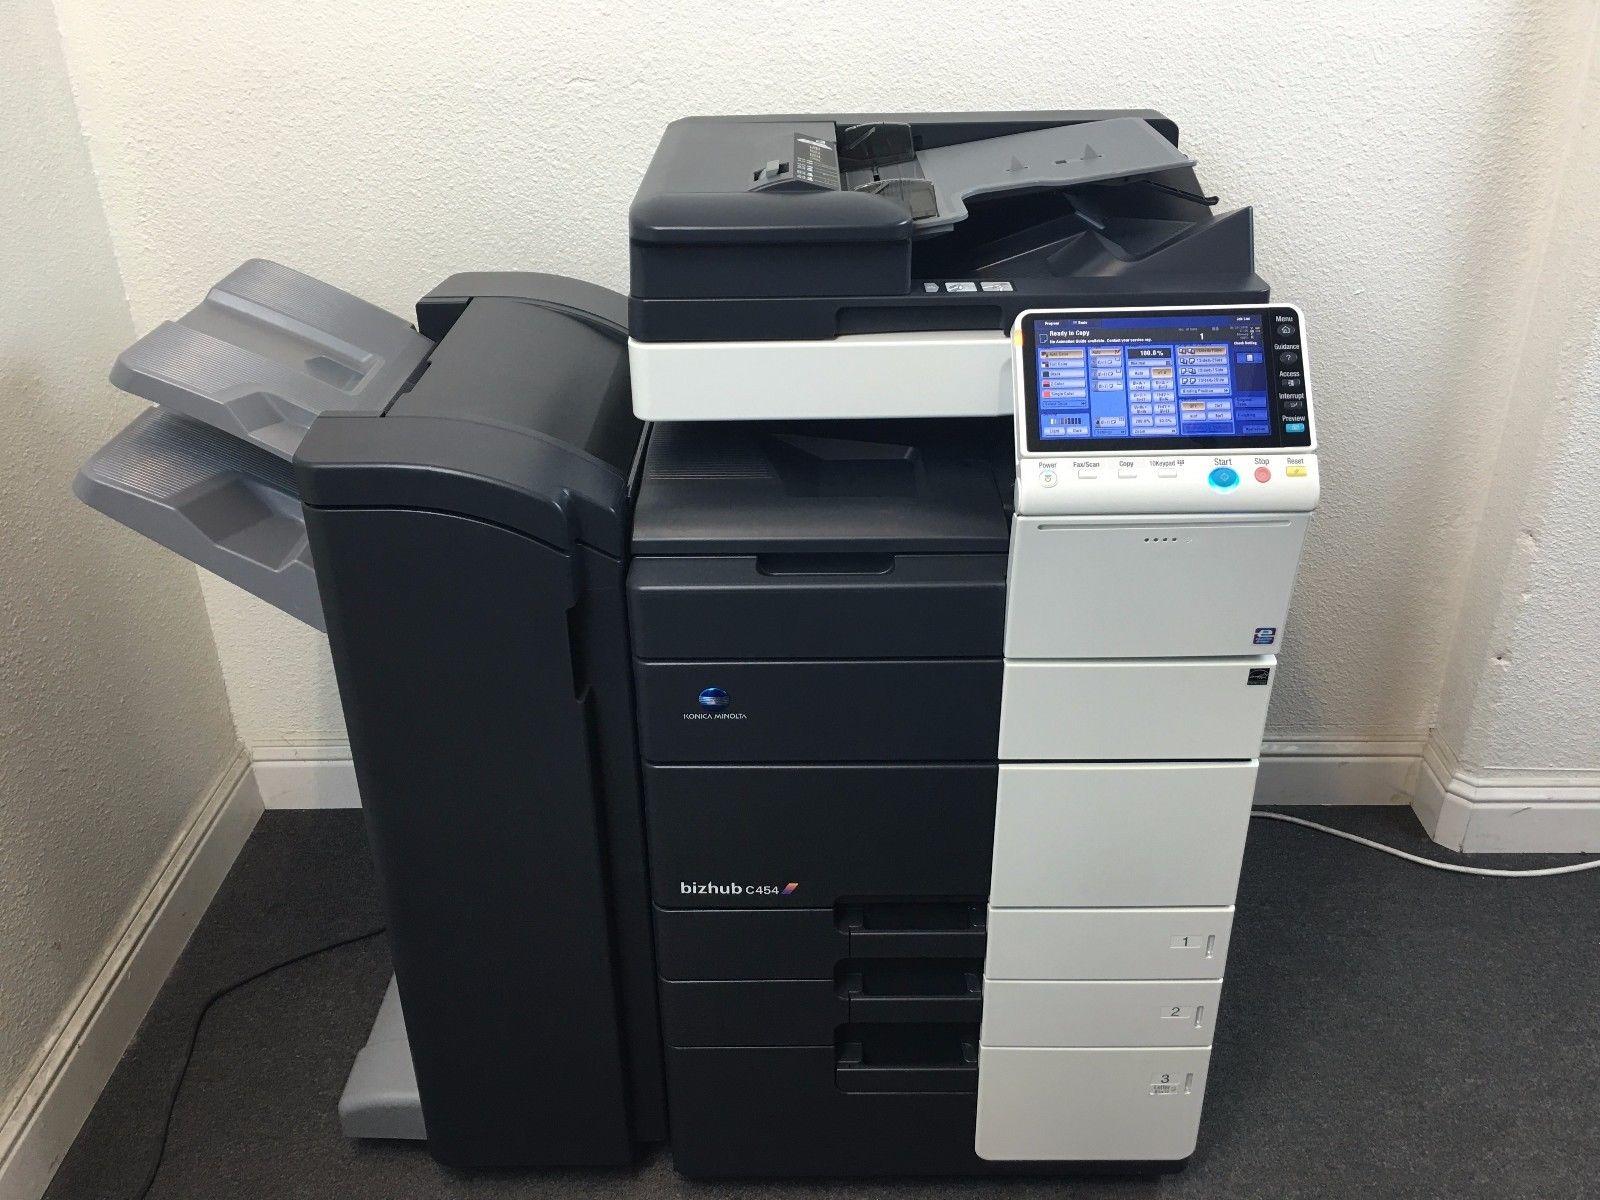 Konica Minolta Bizhub C454 Copier Printer Scanner with Fax LOW meter 162k total by Koinca Minolta